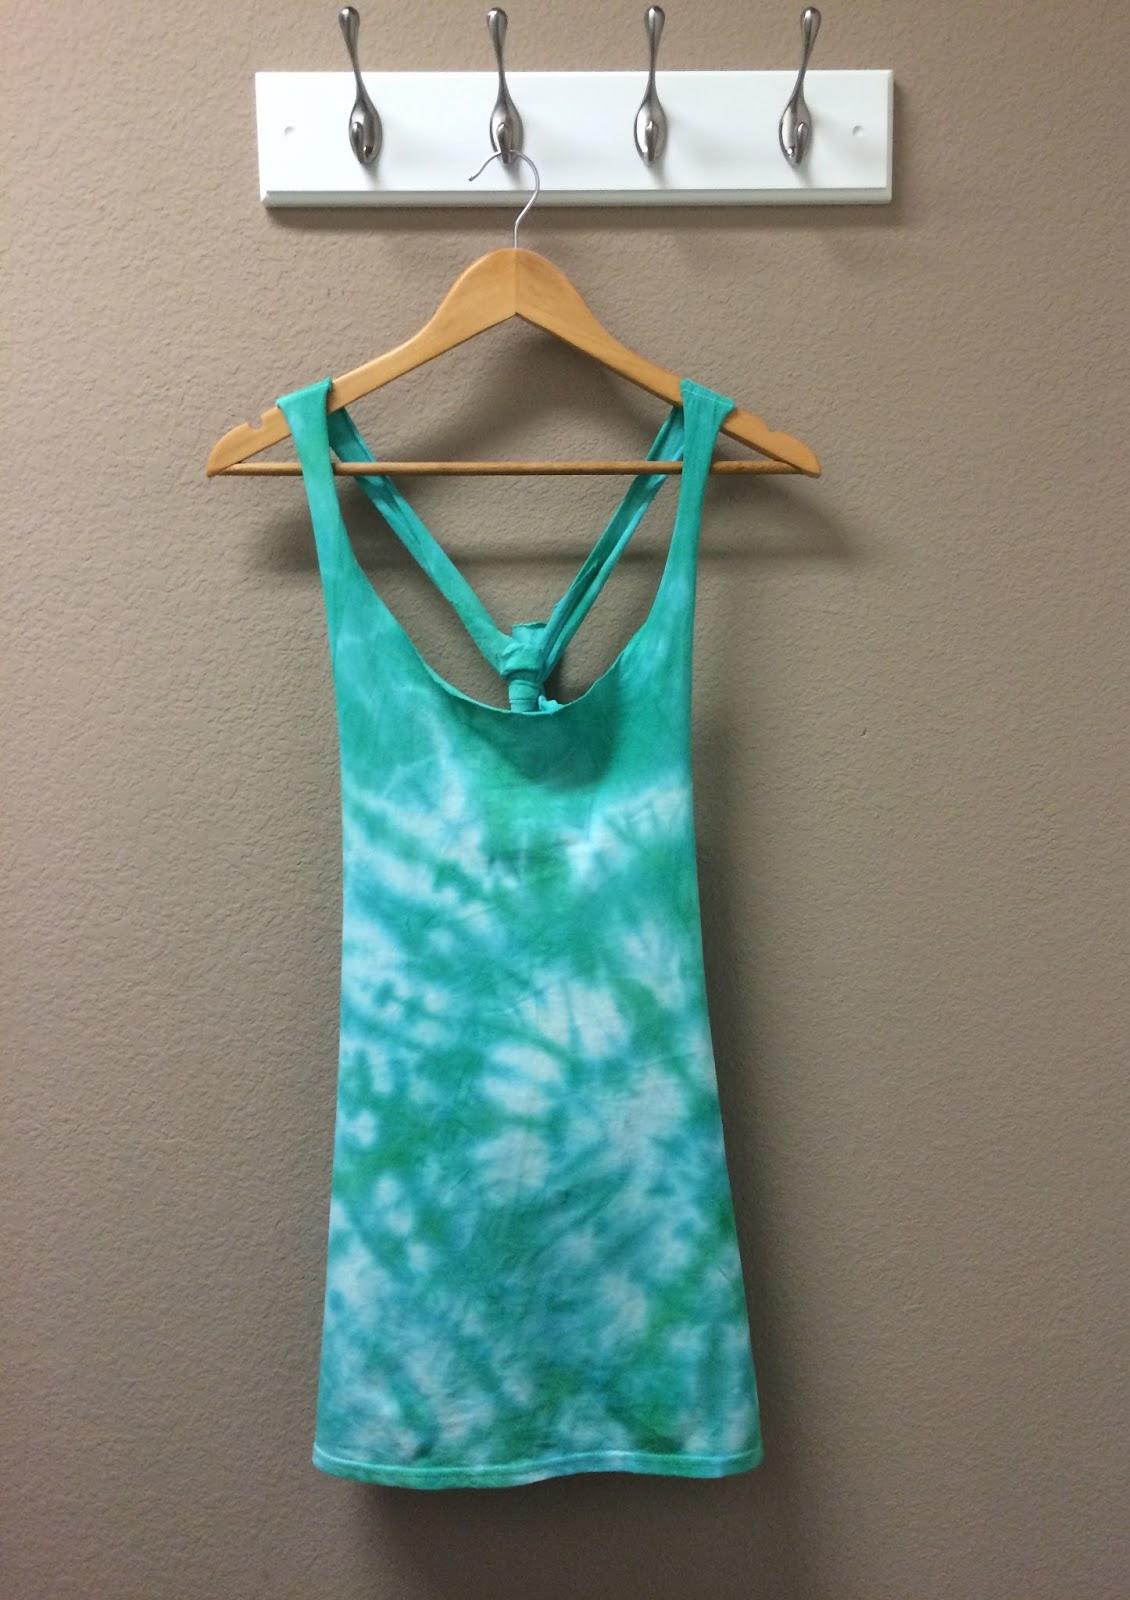 Crafty Texas Girls: Tie Dye \